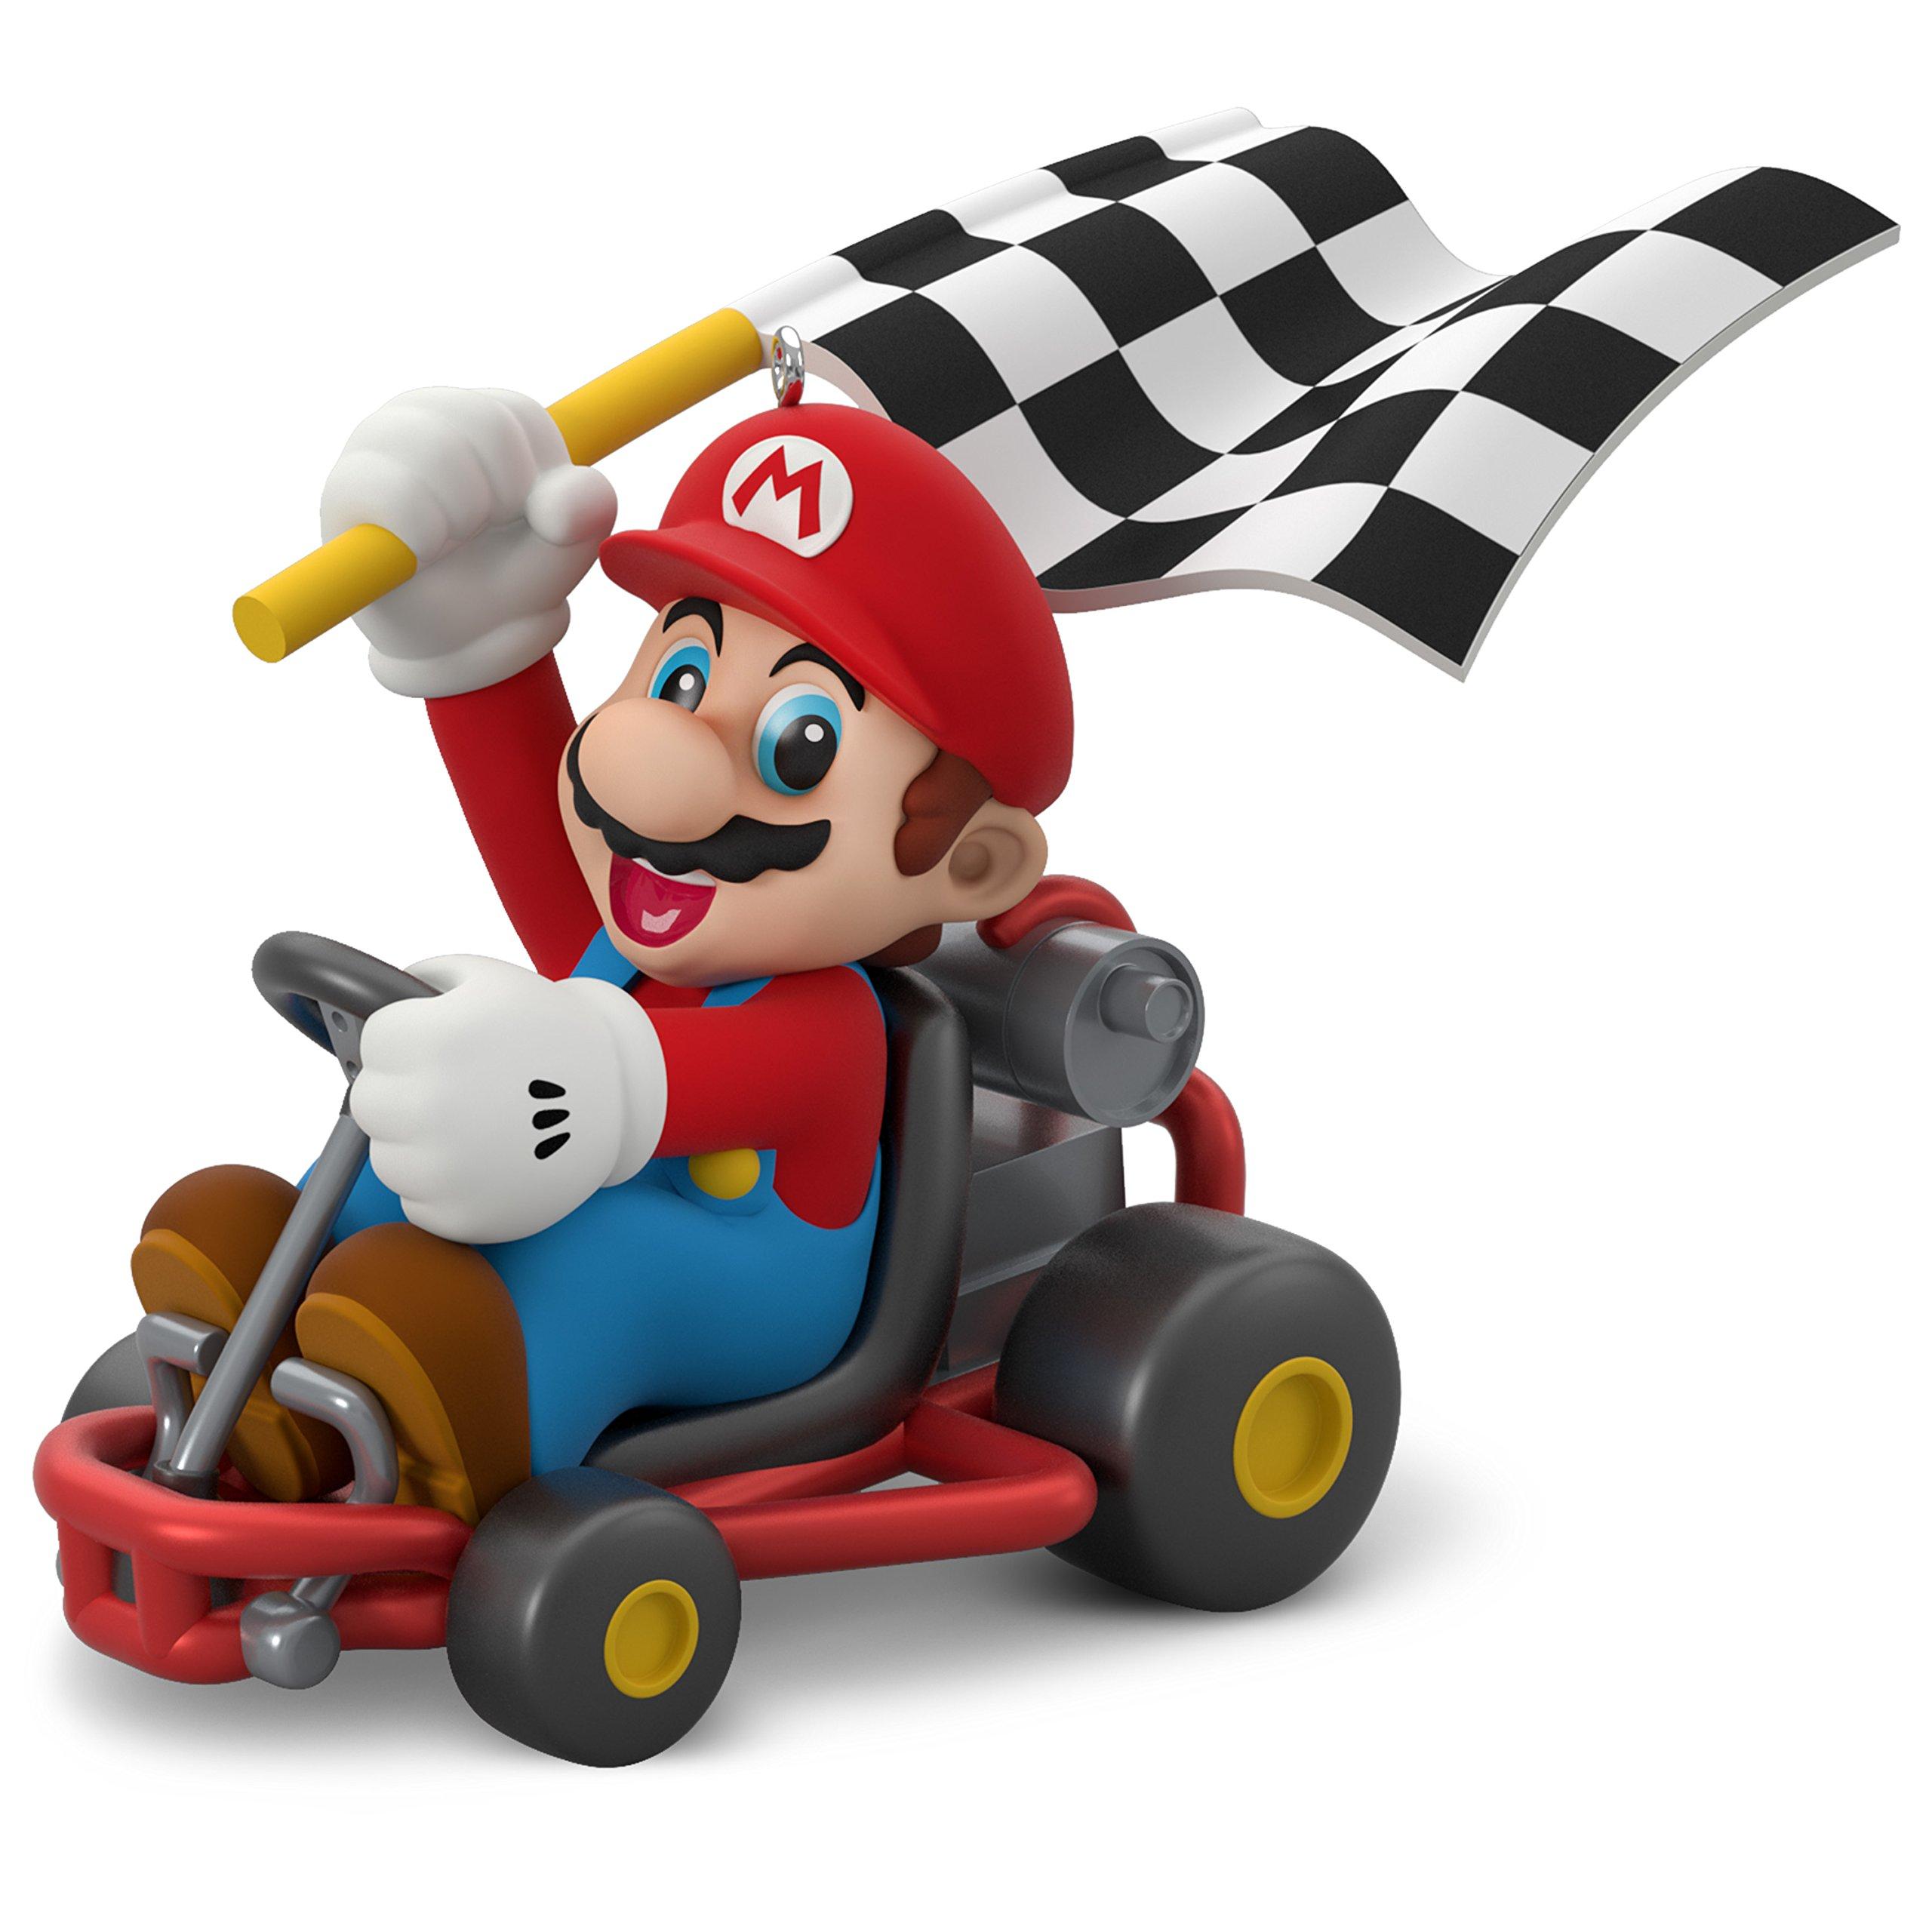 Hallmark Keepsake Christmas Ornament 2018 Year Dated, Nintendo Mario Kart